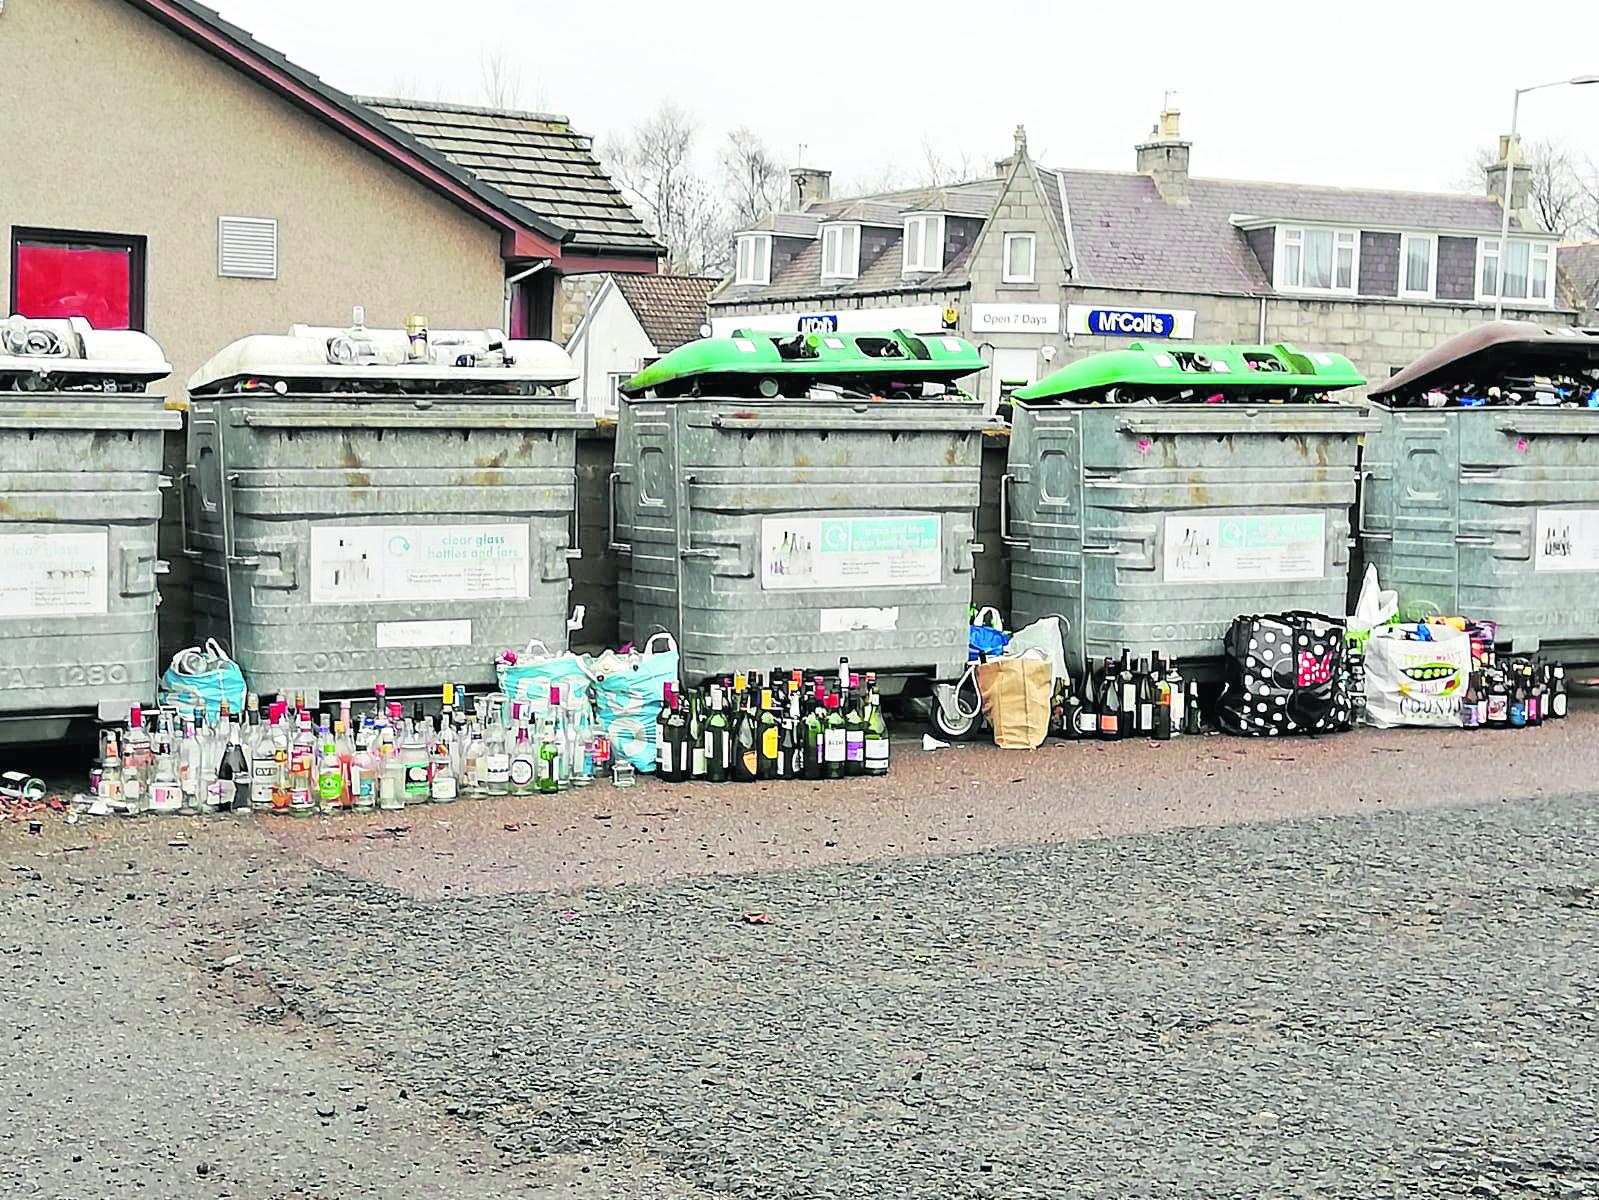 Kemnay recycling bins